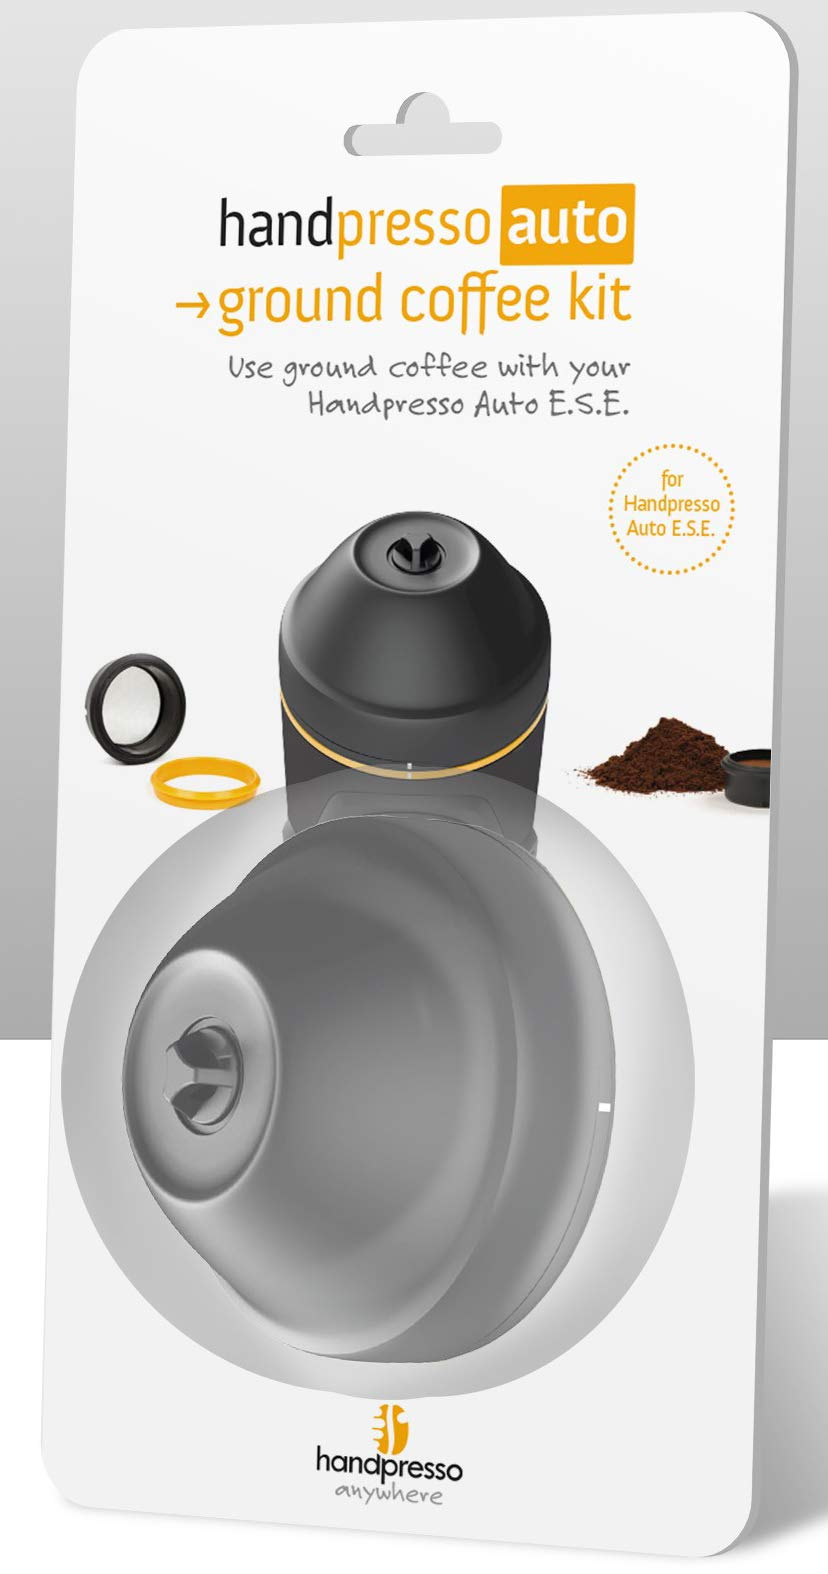 Handpresso Auto Ese - Kit Adaptador para café molido (20 x 10 x 4 cm), Color Negro: Amazon.es: Hogar